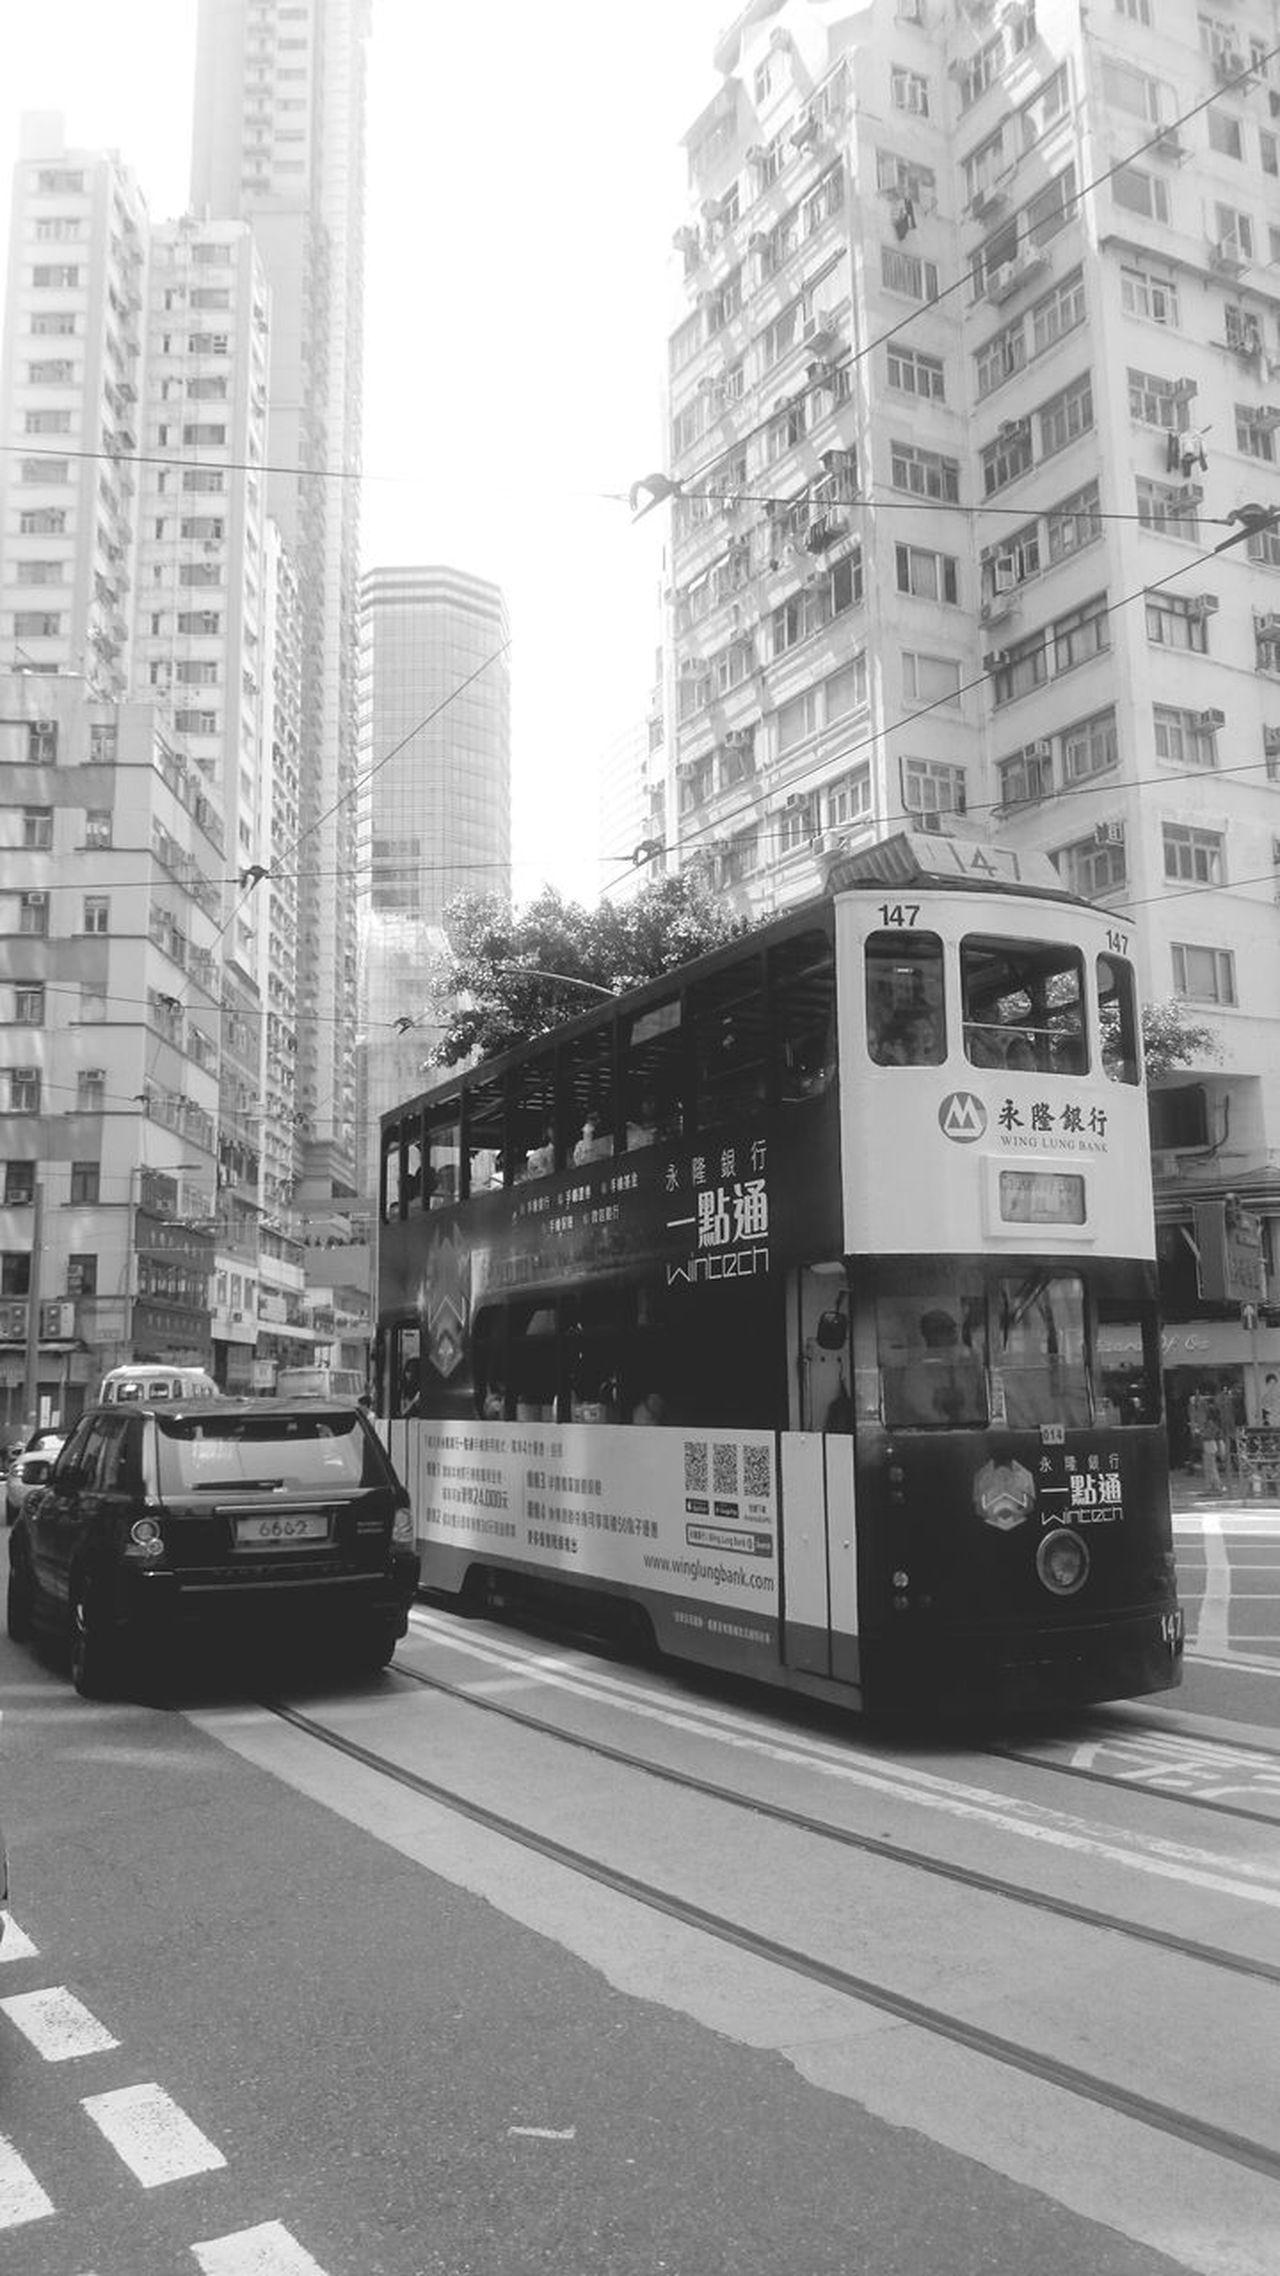 Hongkong Black&white Hongkongcollection Hong Kong City HongKong Hongkongphotography Hongkongcity Hongkongstreet Hongkonglife Blackandwhite Black And White B&w Street Photography Fortheloveofblackandwhite Blackandwhite Photography Street Photography The Street Photographer - 2017 EyeEm Awards